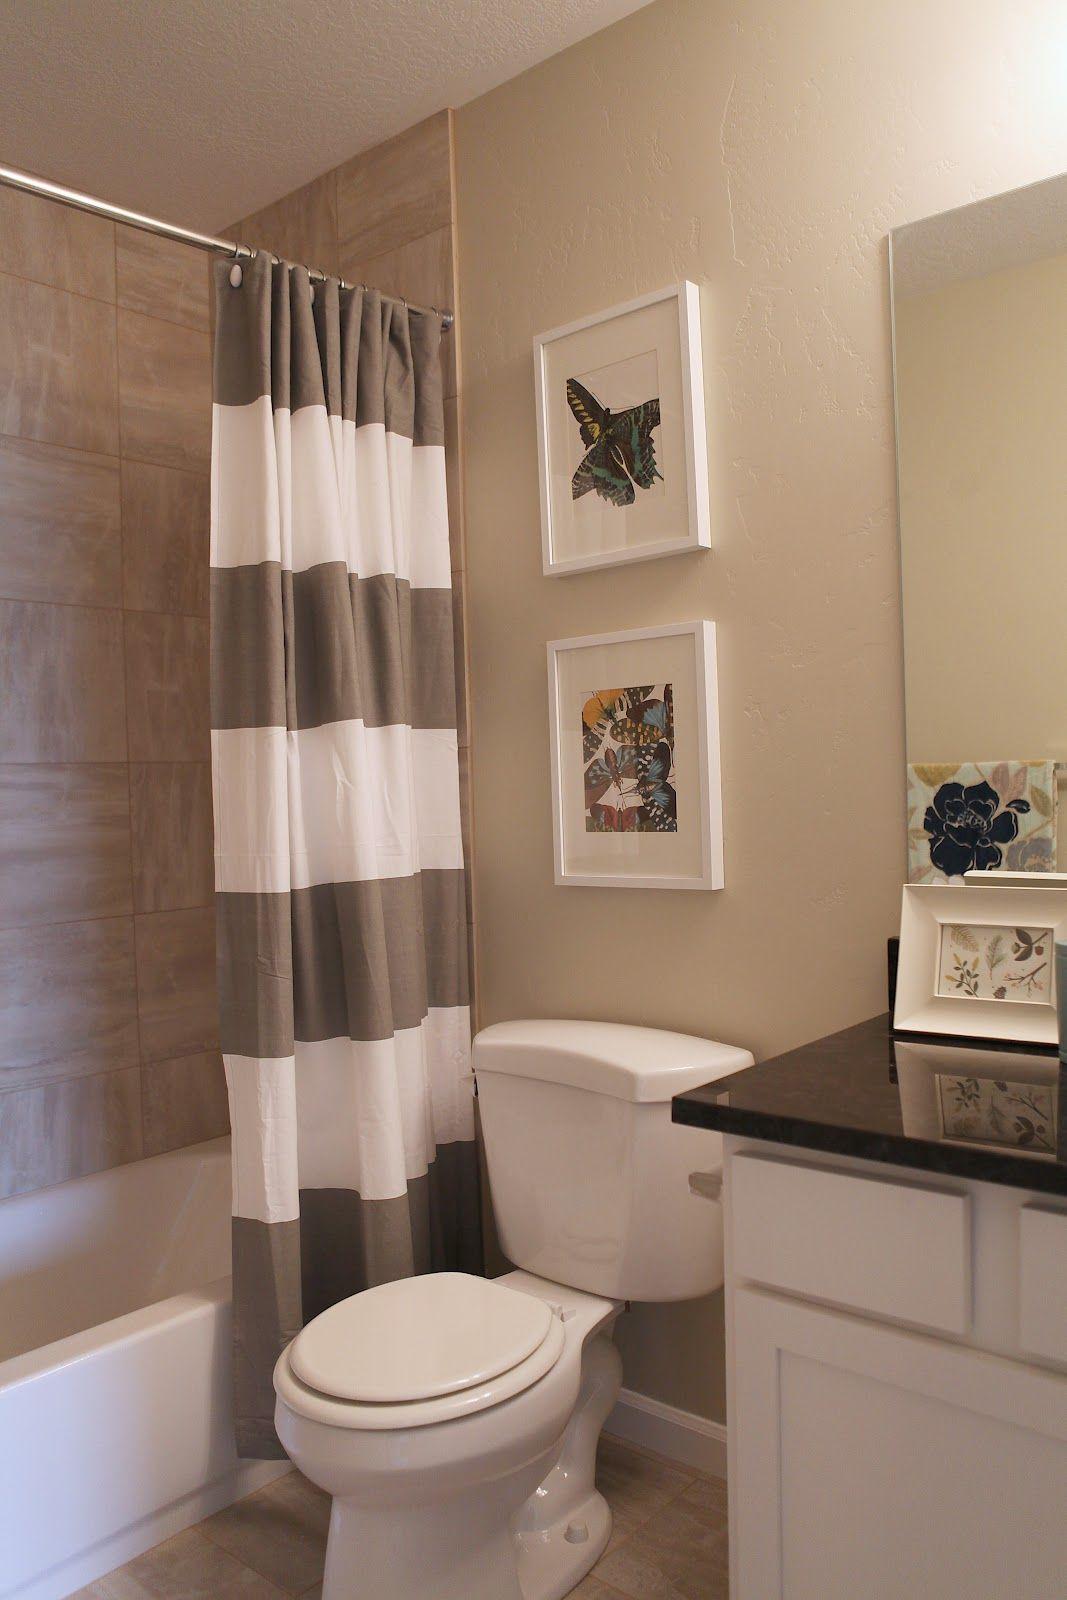 Mejores Imágenes Sobre Bathroom Remodel En Pinterest Cuartos - Brown and white striped shower curtain